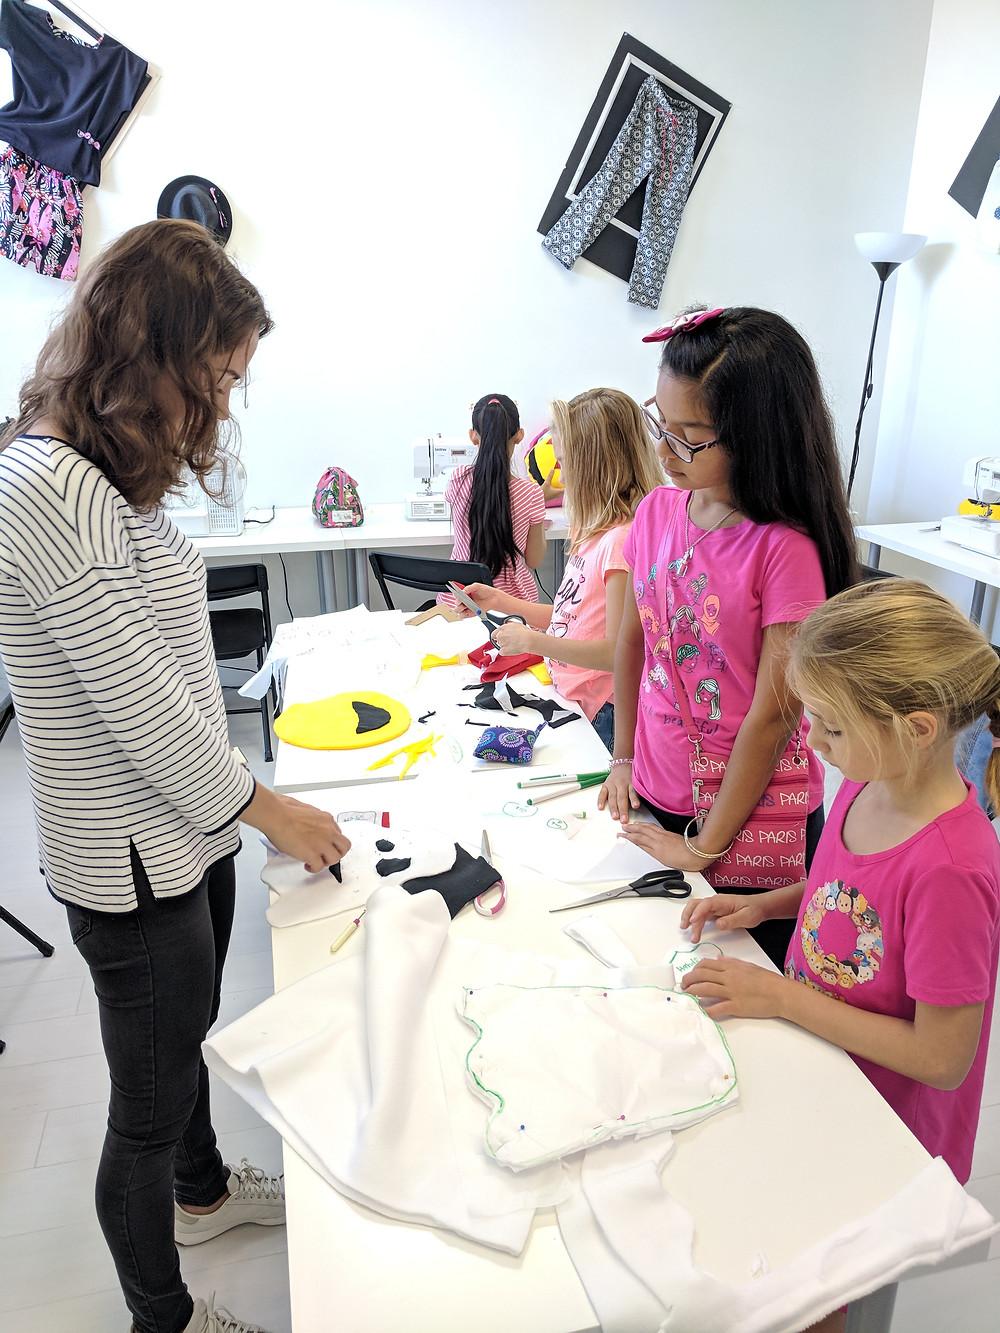 Summer Sewing and Fashion Camp Weston